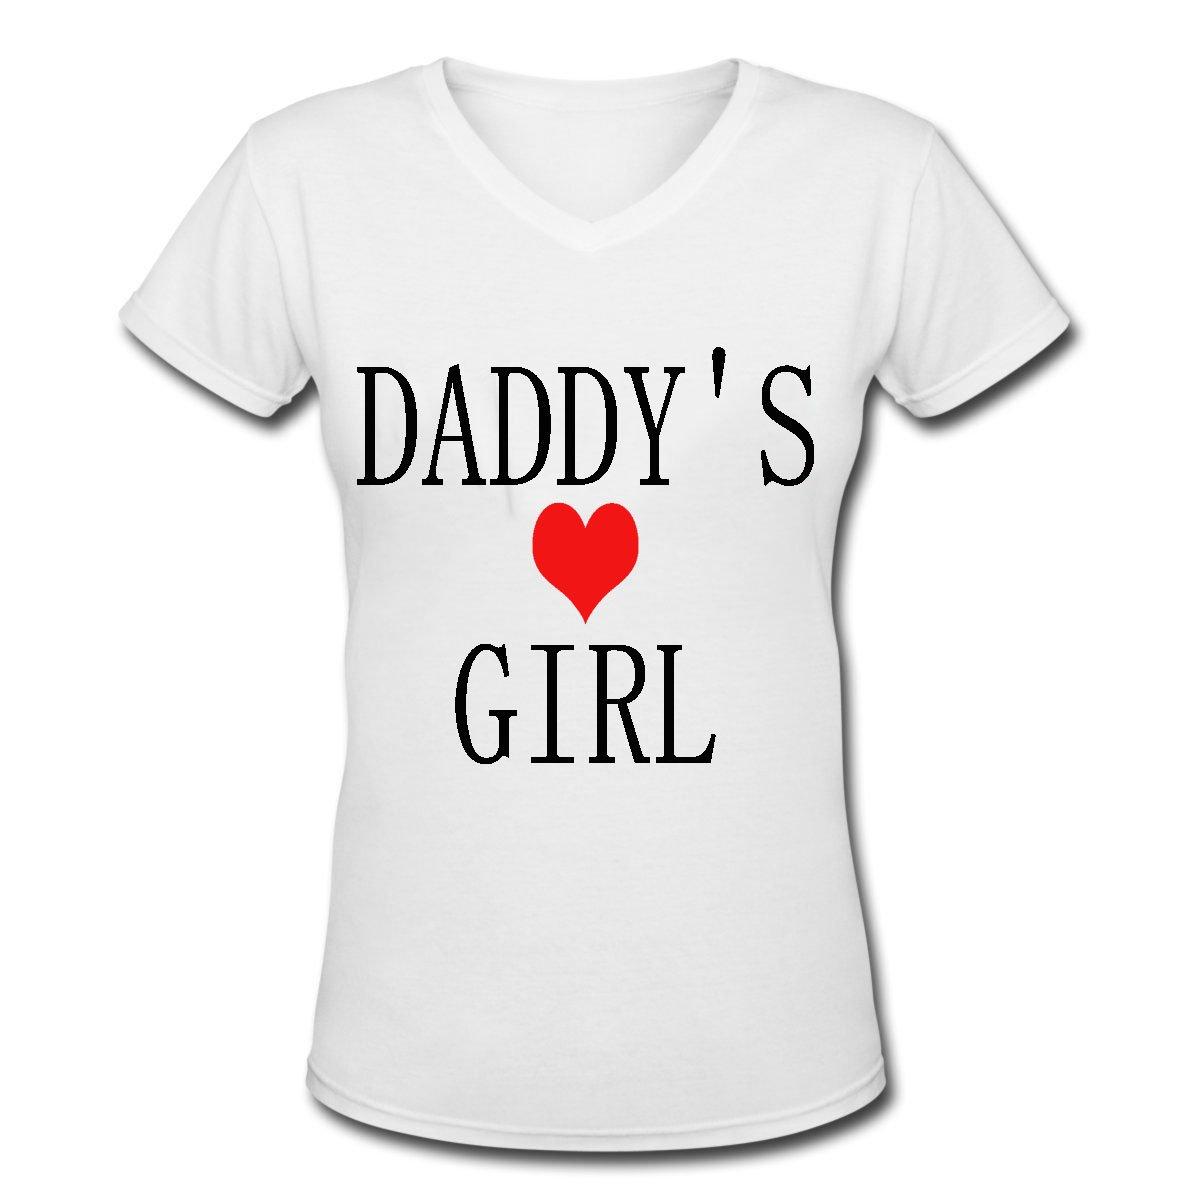 01feee47f Amazon.com: Gongshaoming Daddy's Girl Women's Short Sleeve V-Neck T-Shirt:  Clothing